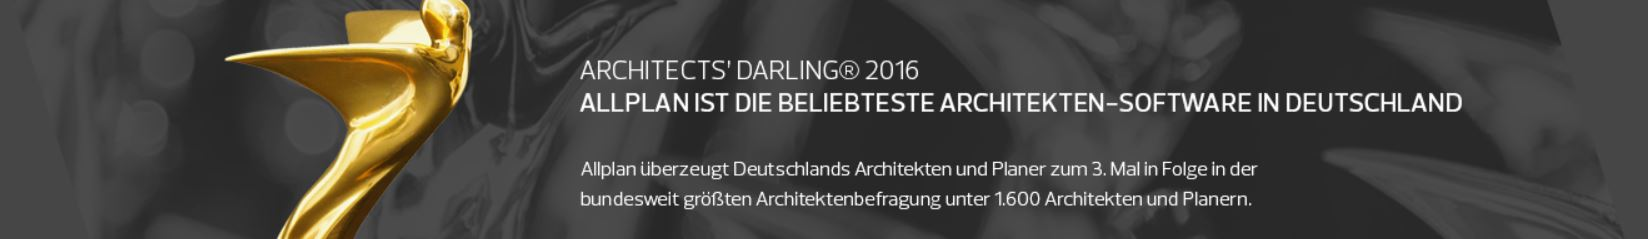 Darling 2016